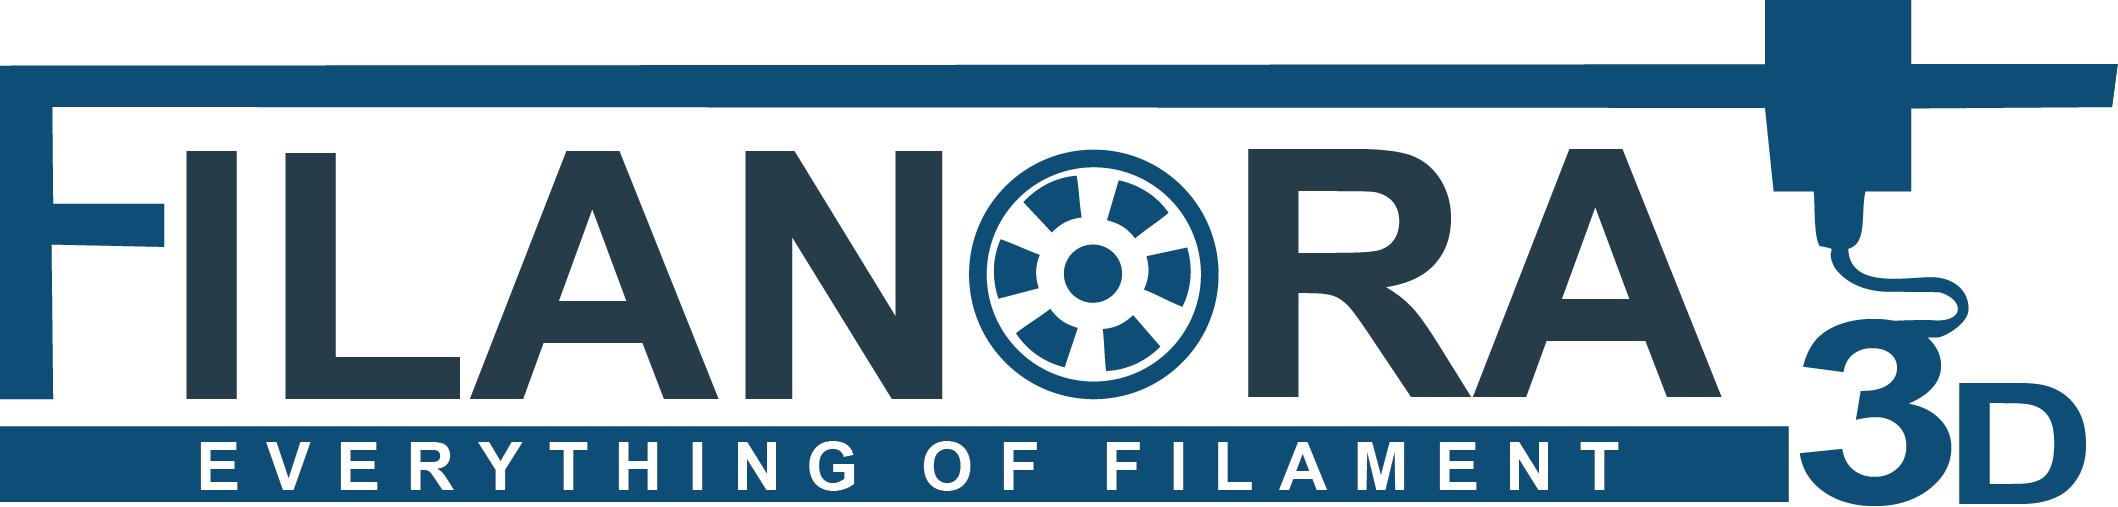 Filanora